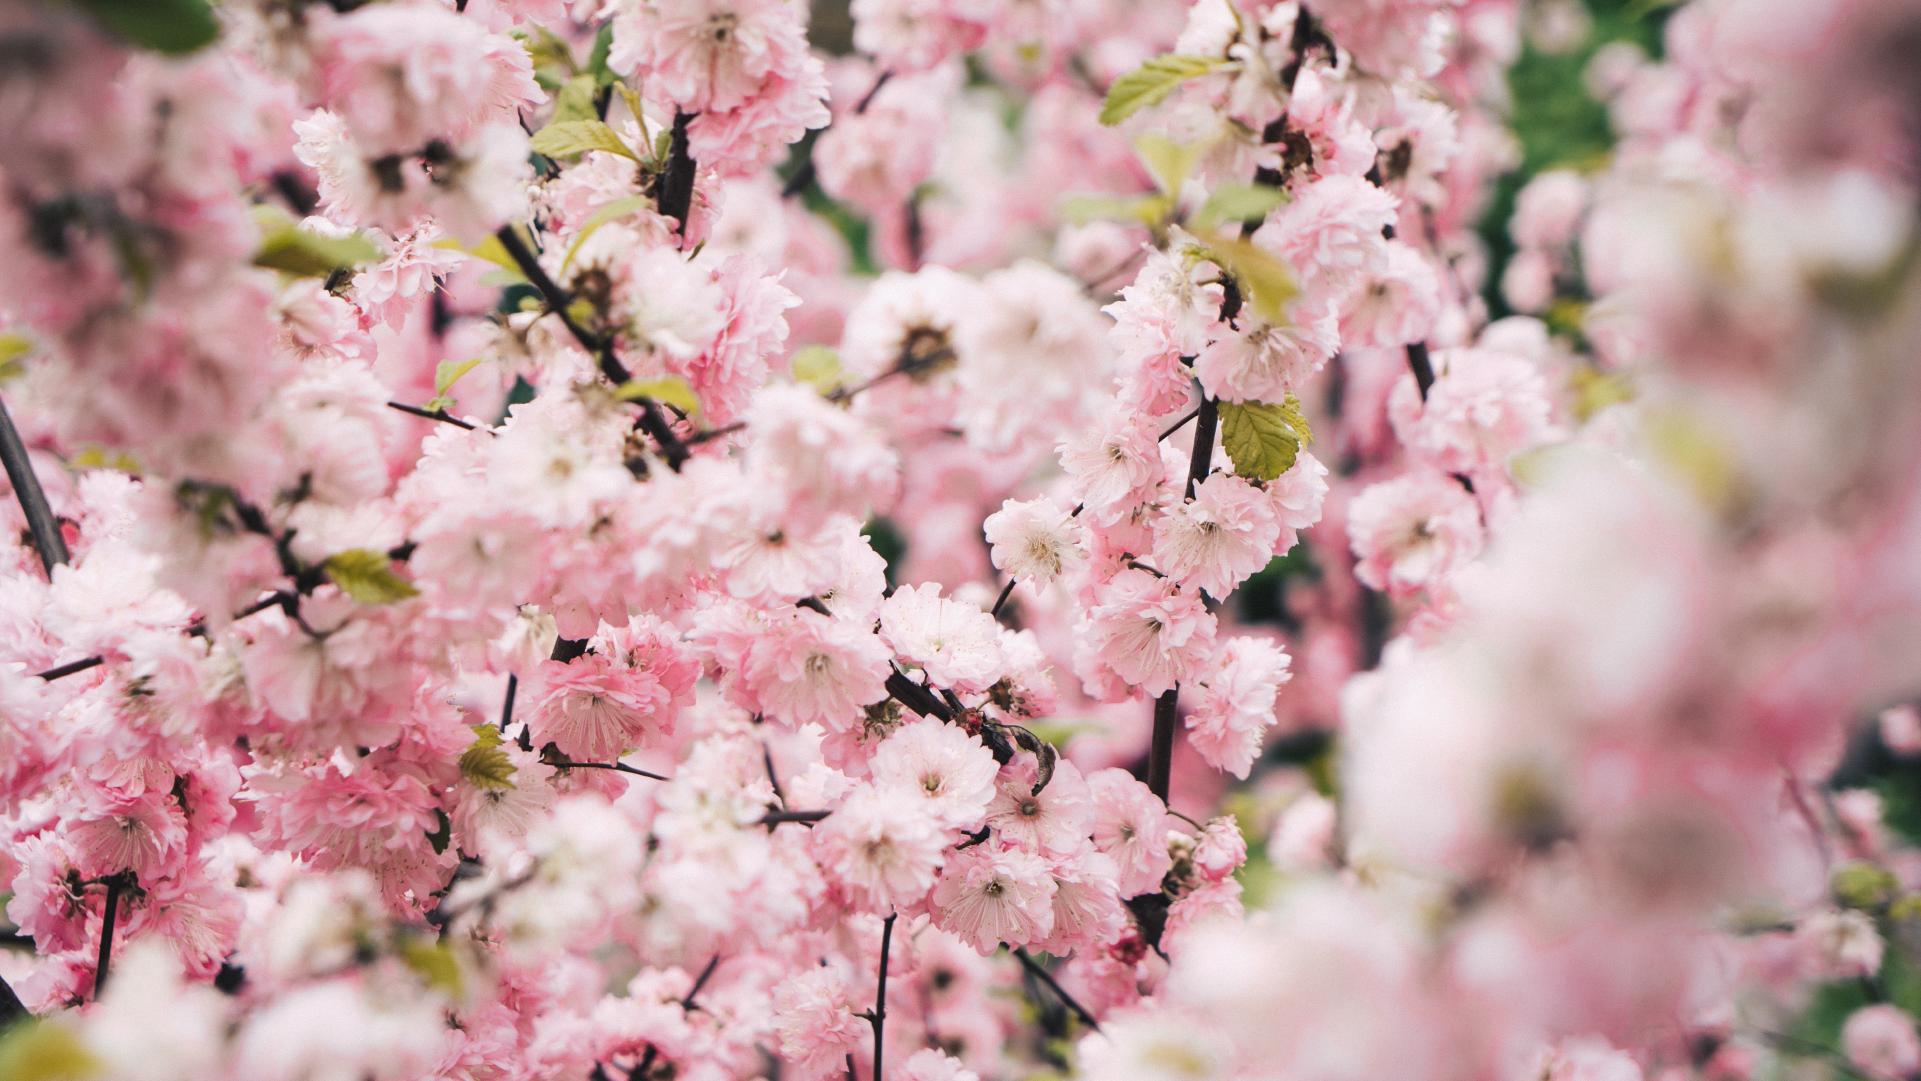 ceresna-kvety-ovocny-strom-konare-listy